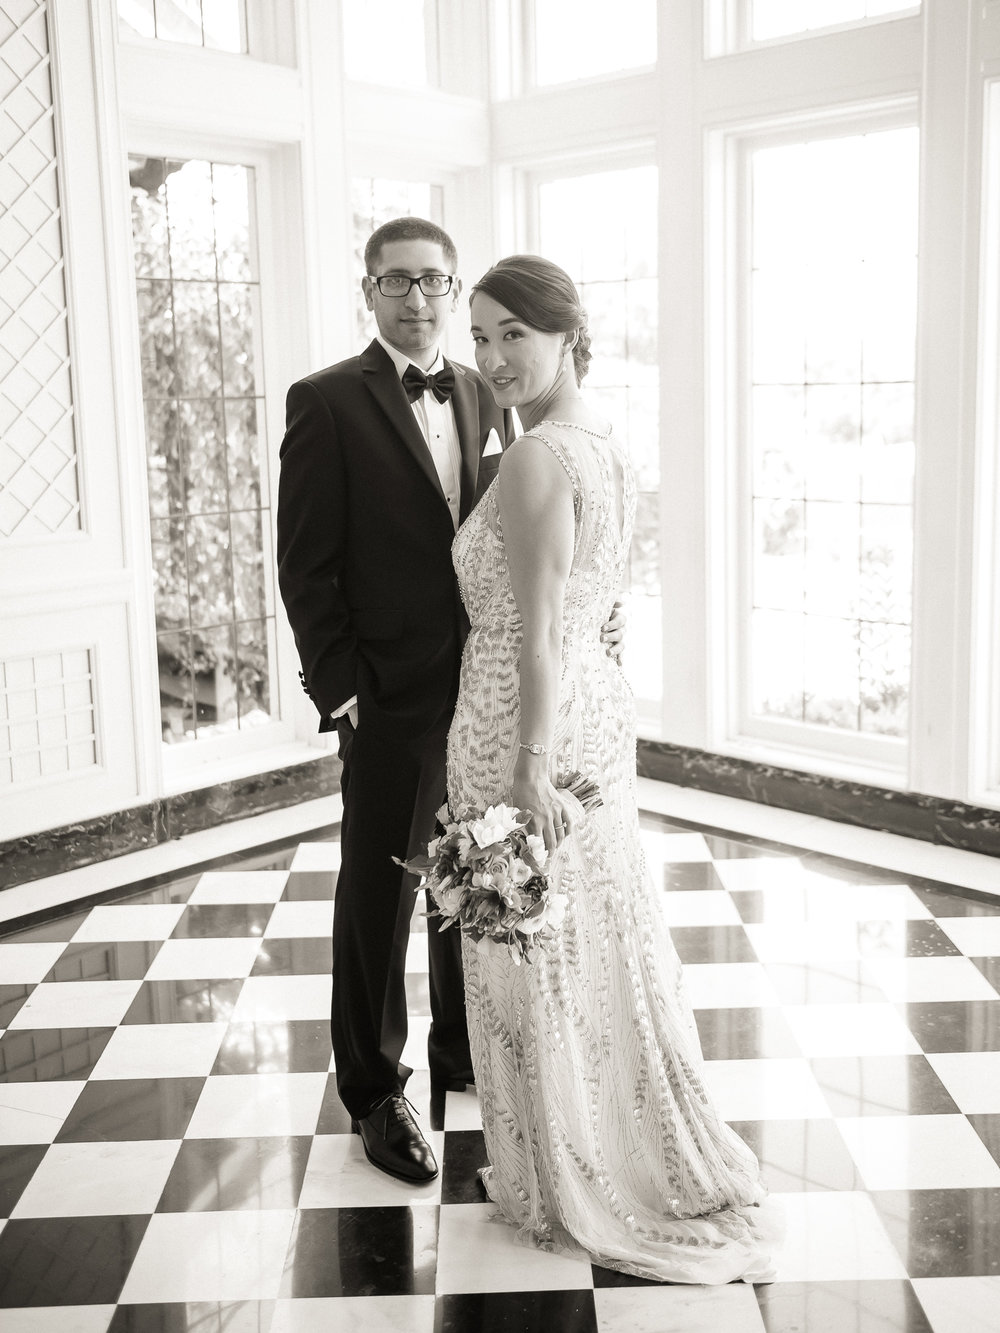 Sarah+Warren_wedding_spp-50.jpg